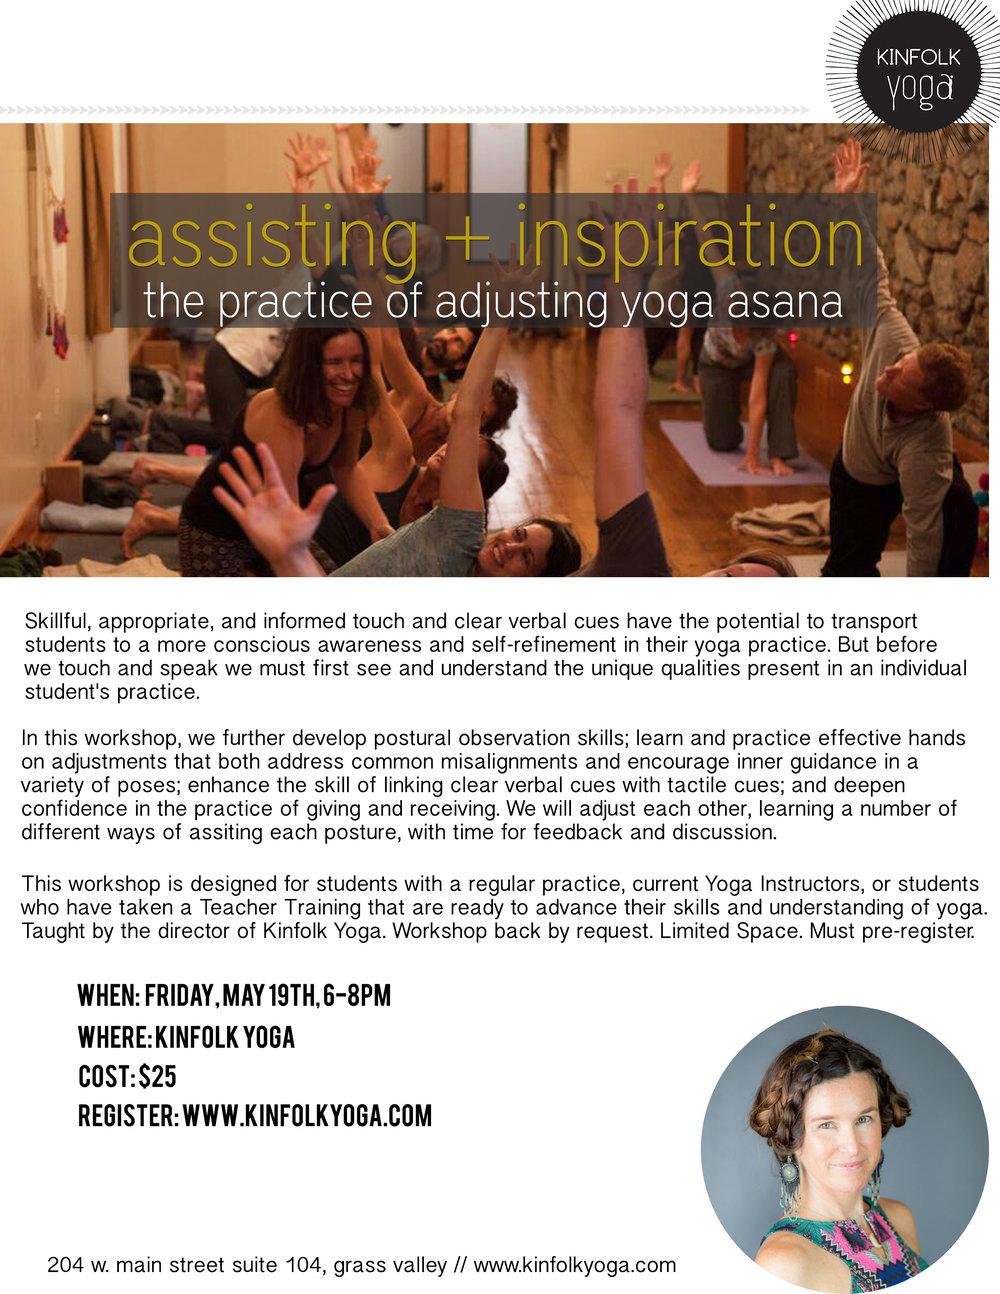 kinfolk yoga workshop adjustments yoga inspiration